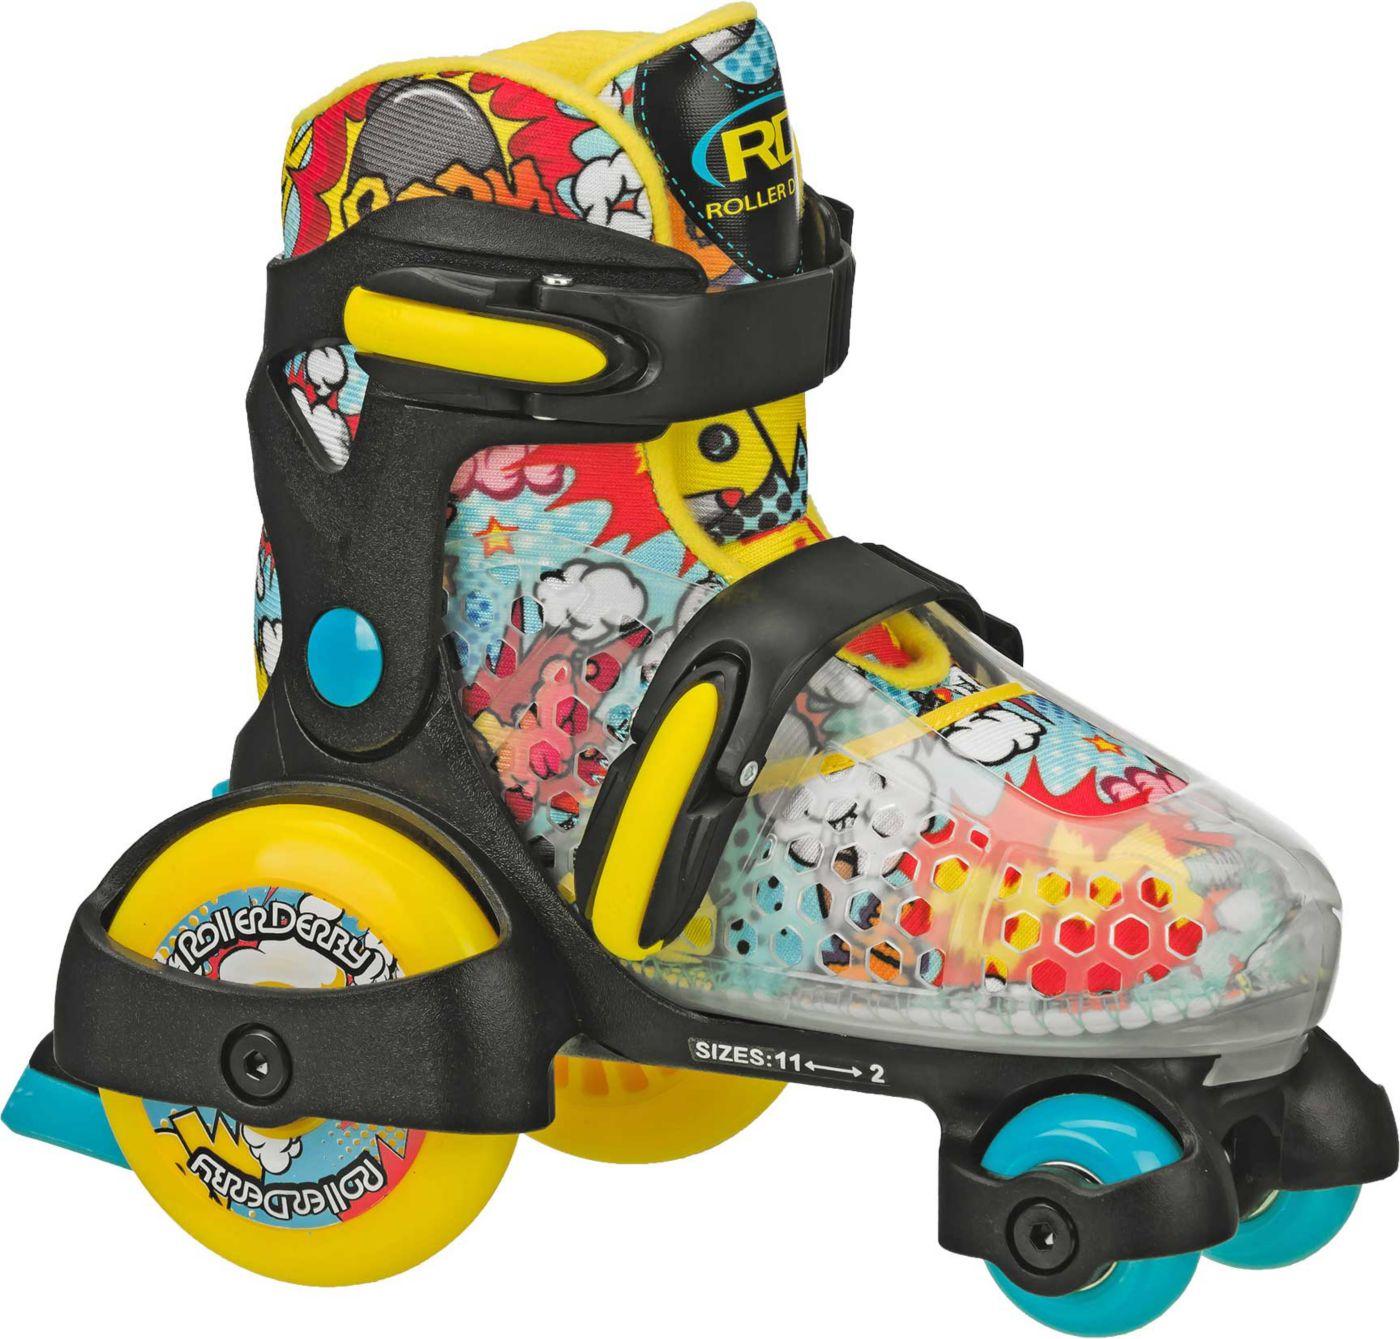 Roller Derby Boys' Jr. Fun Roll Adjustable Roller Skates